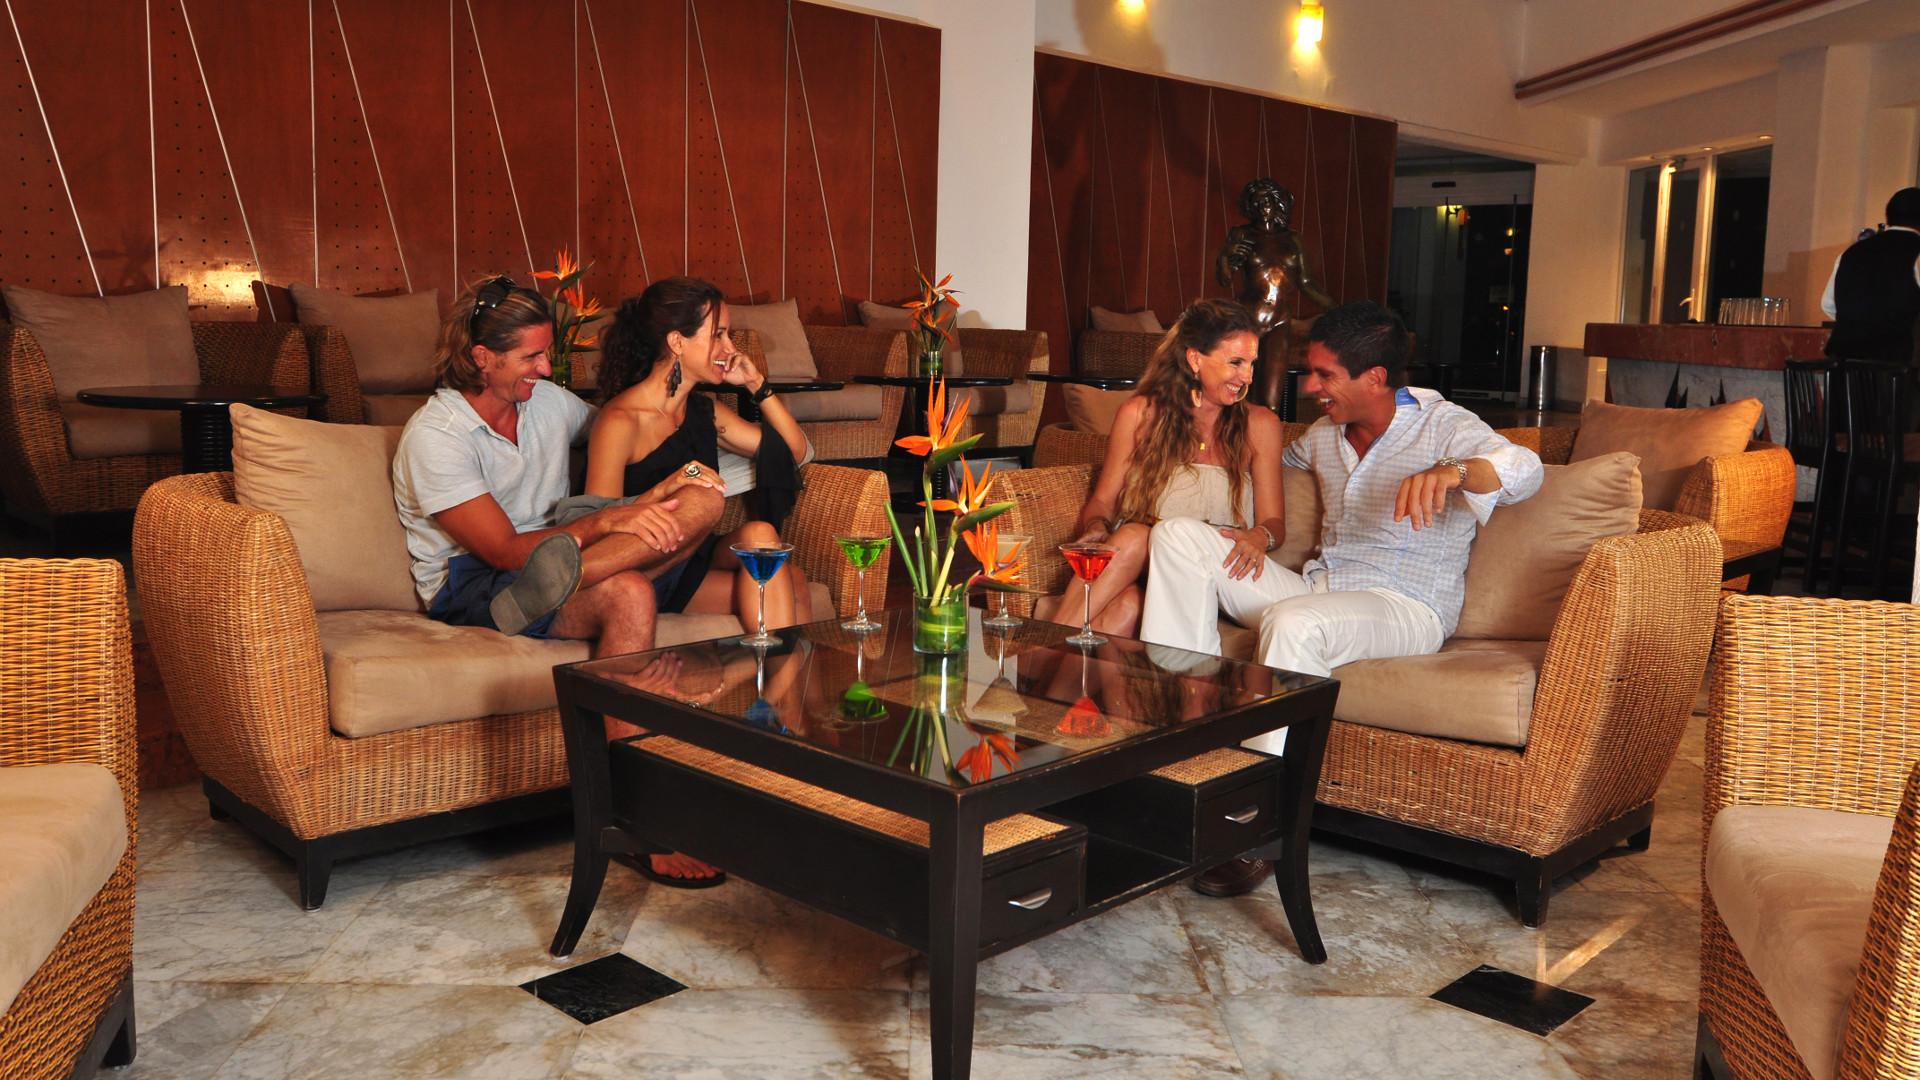 Share Cancun - Hoteles - Sunset Marina Resort & Yacht Club   Centro de consumo - Lobby bar